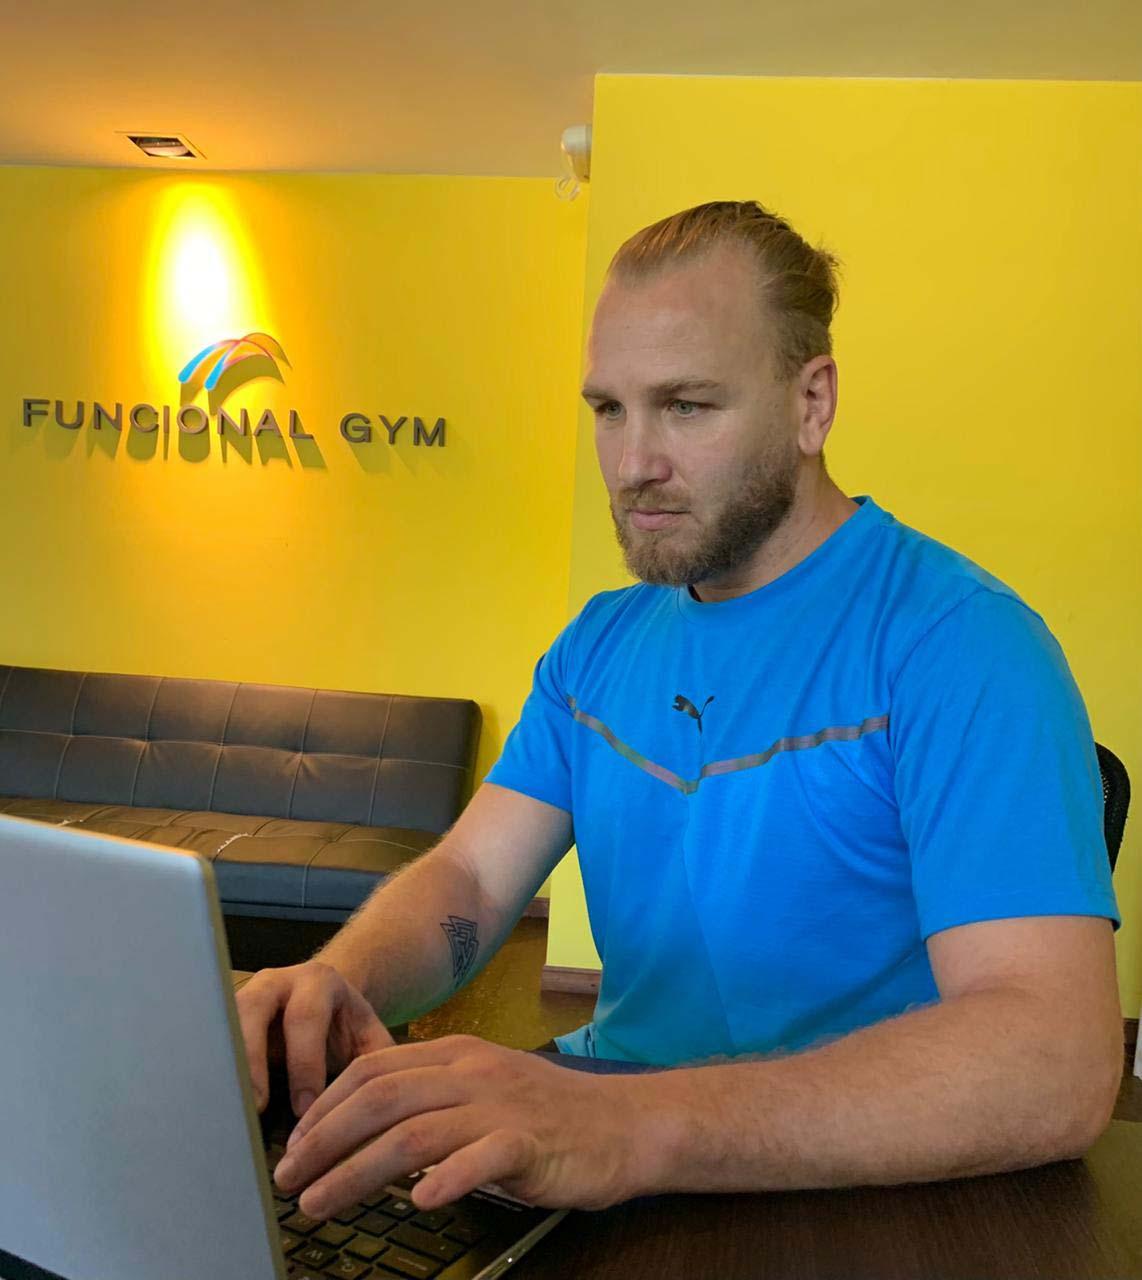 El estudio Funcional Gym se reconvirtió a un modelo 100% digital